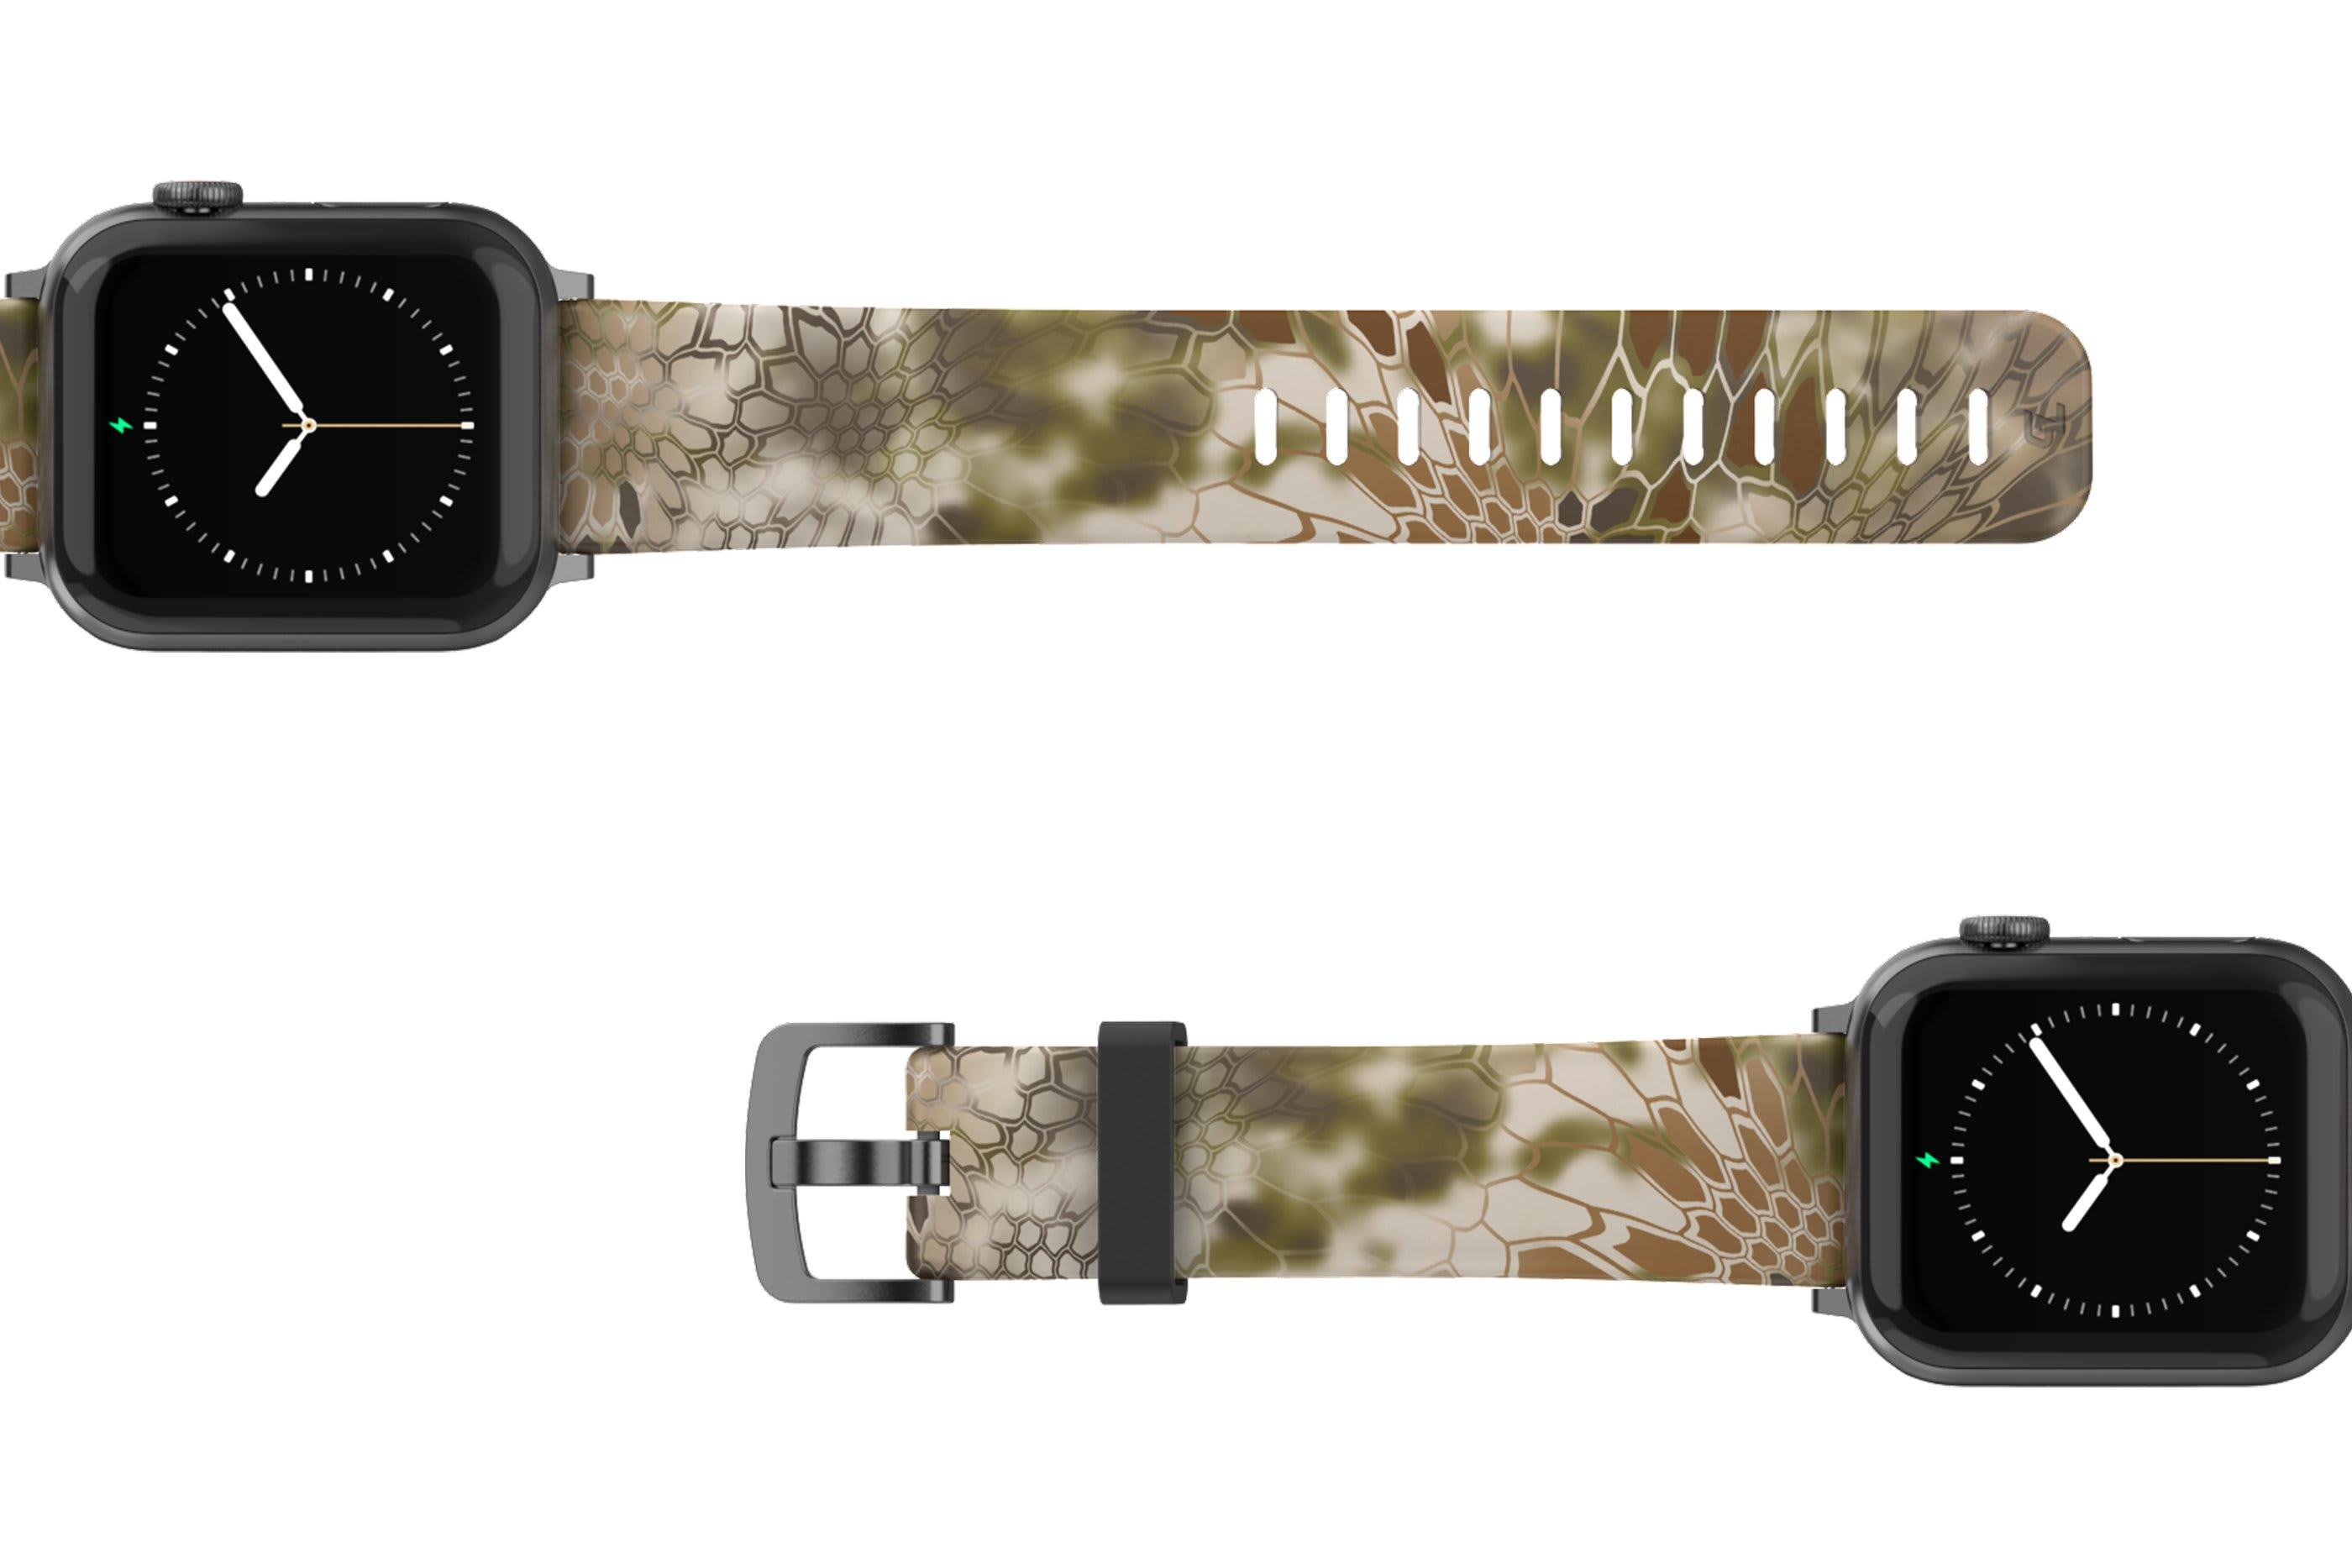 Kryptek Highlander Apple Watch Band with gray hardware viewed top down